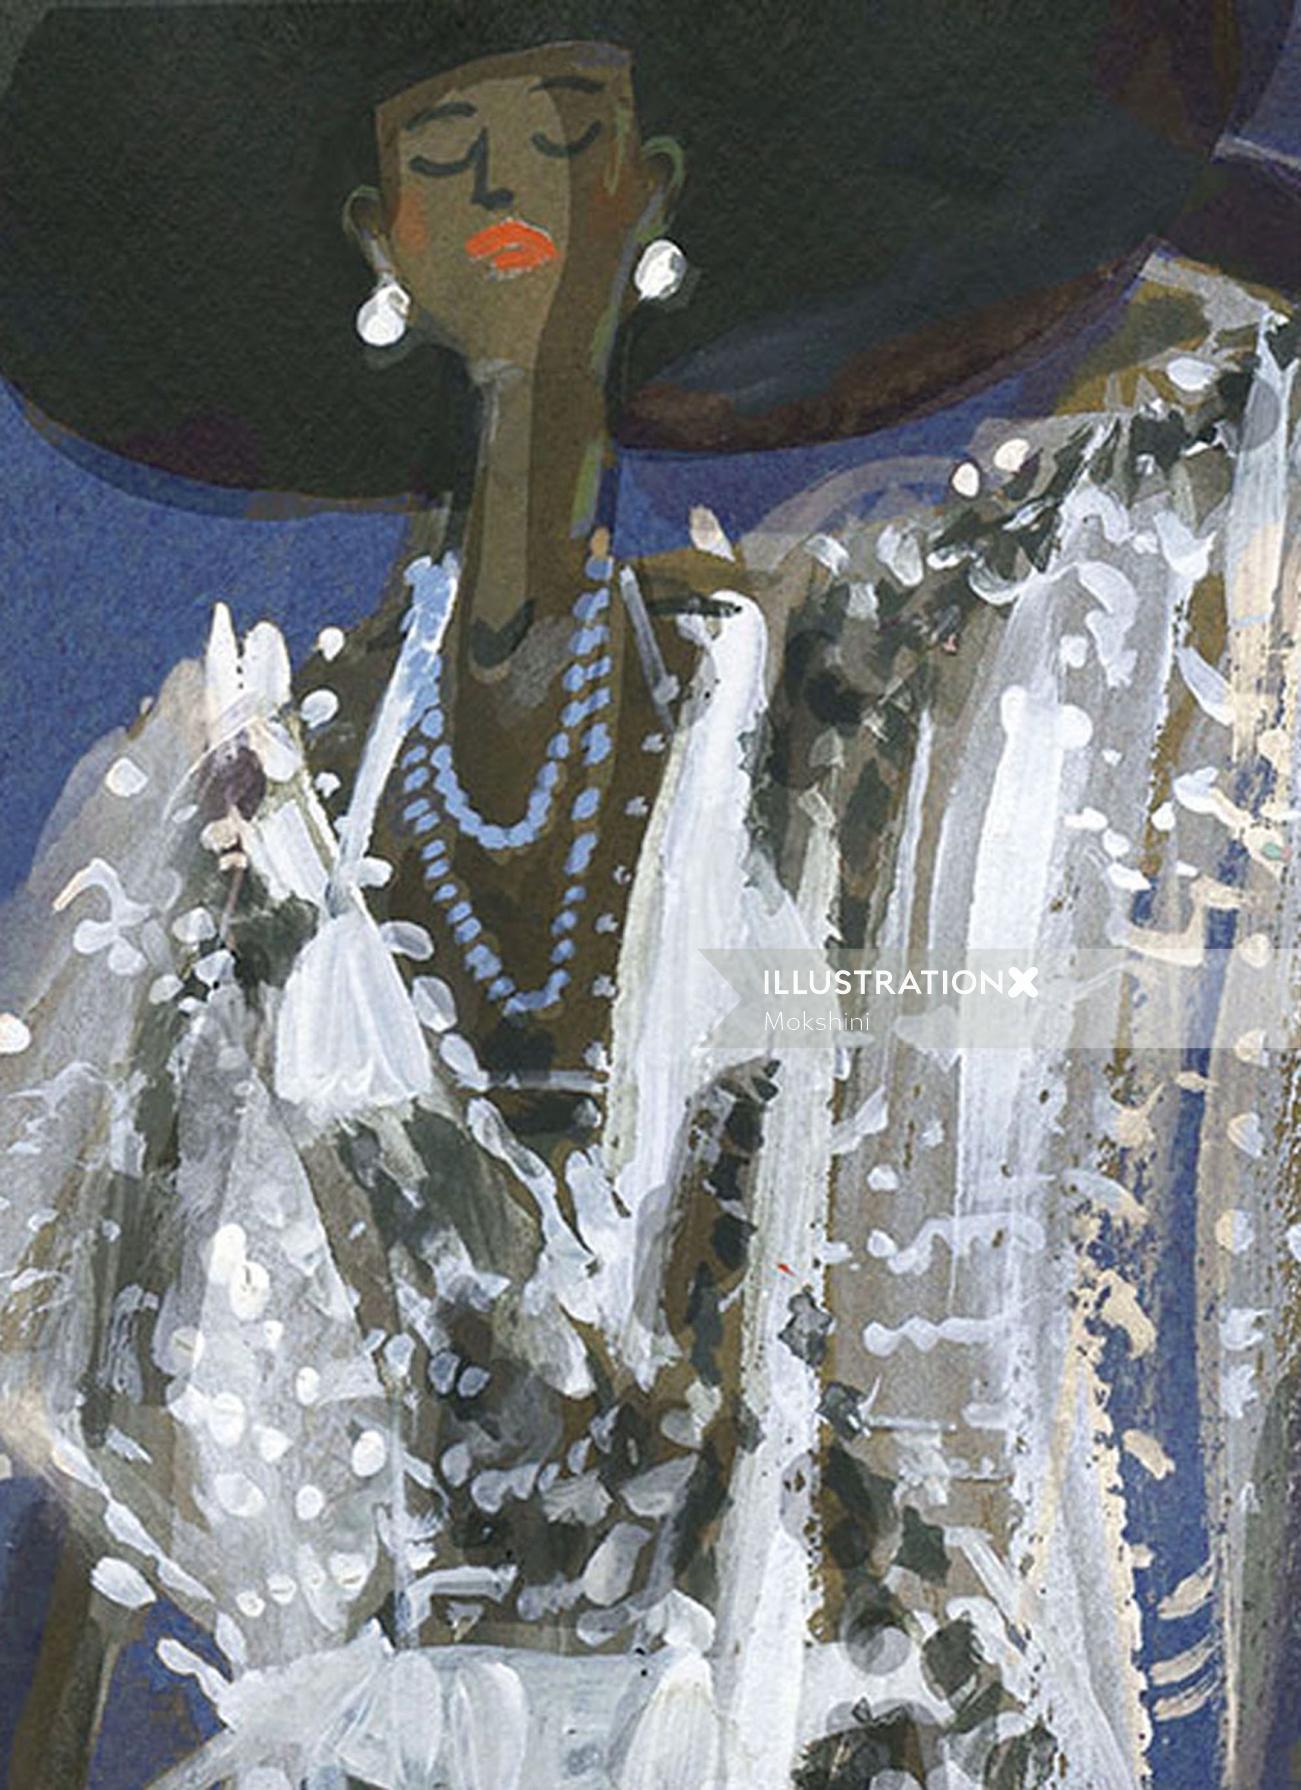 Fashion illustration of Hampton's getup